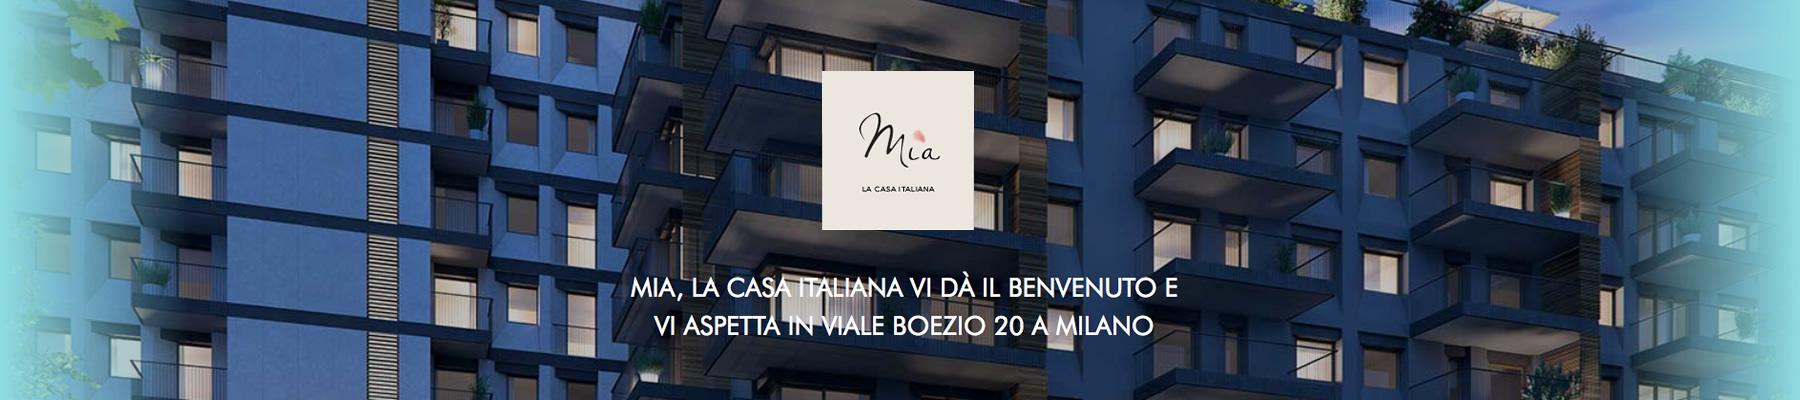 Mia - Web presentation